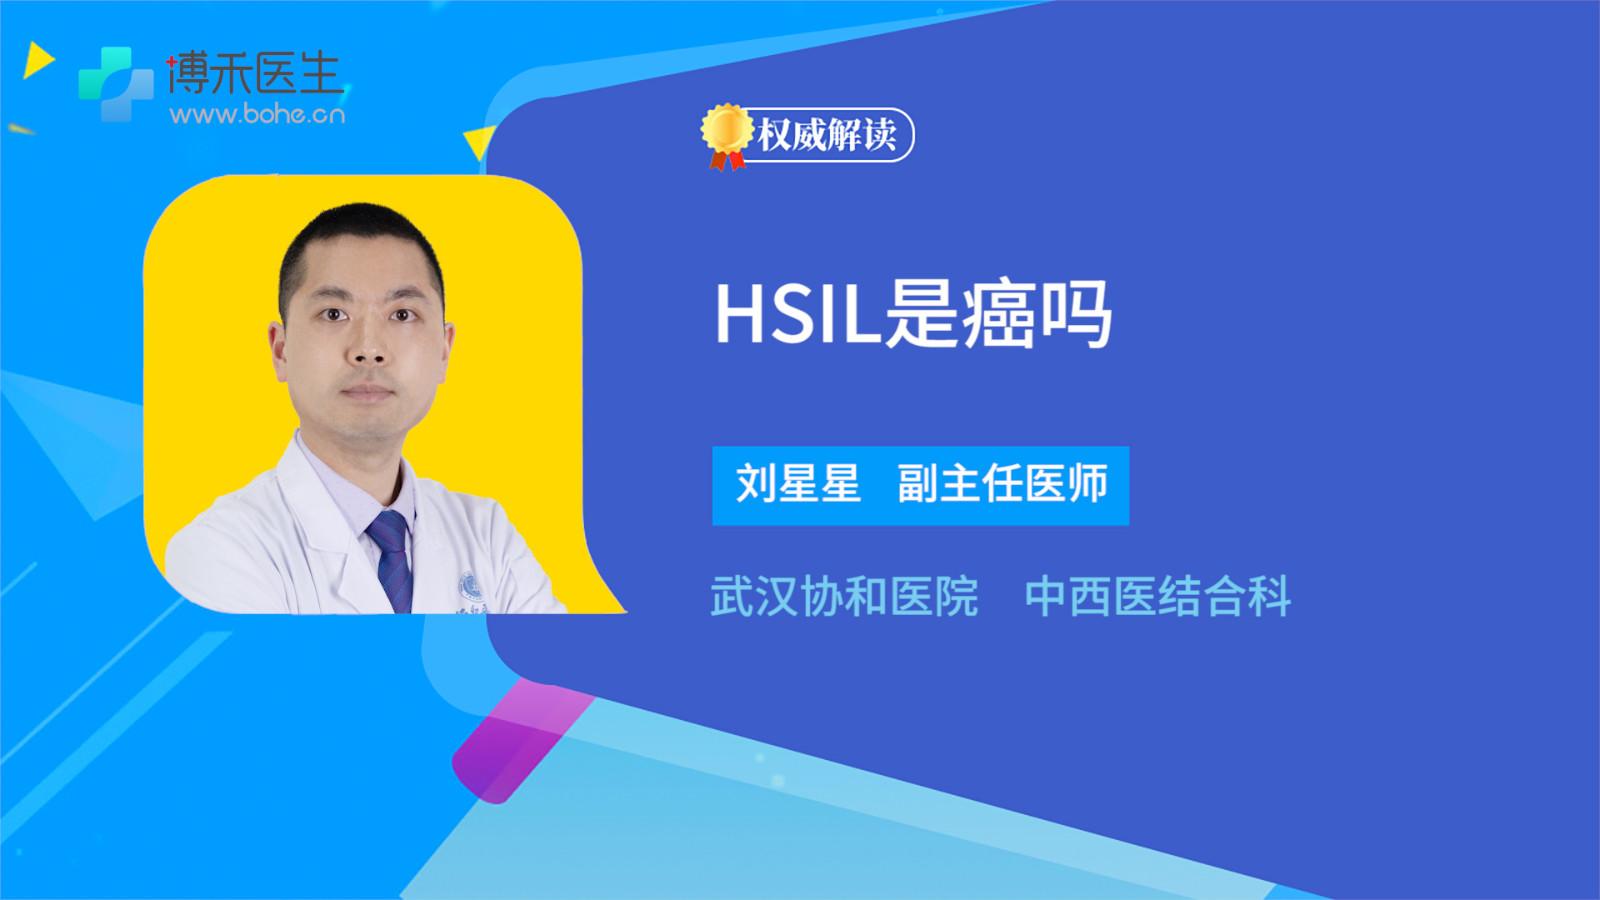 HSIL是癌吗